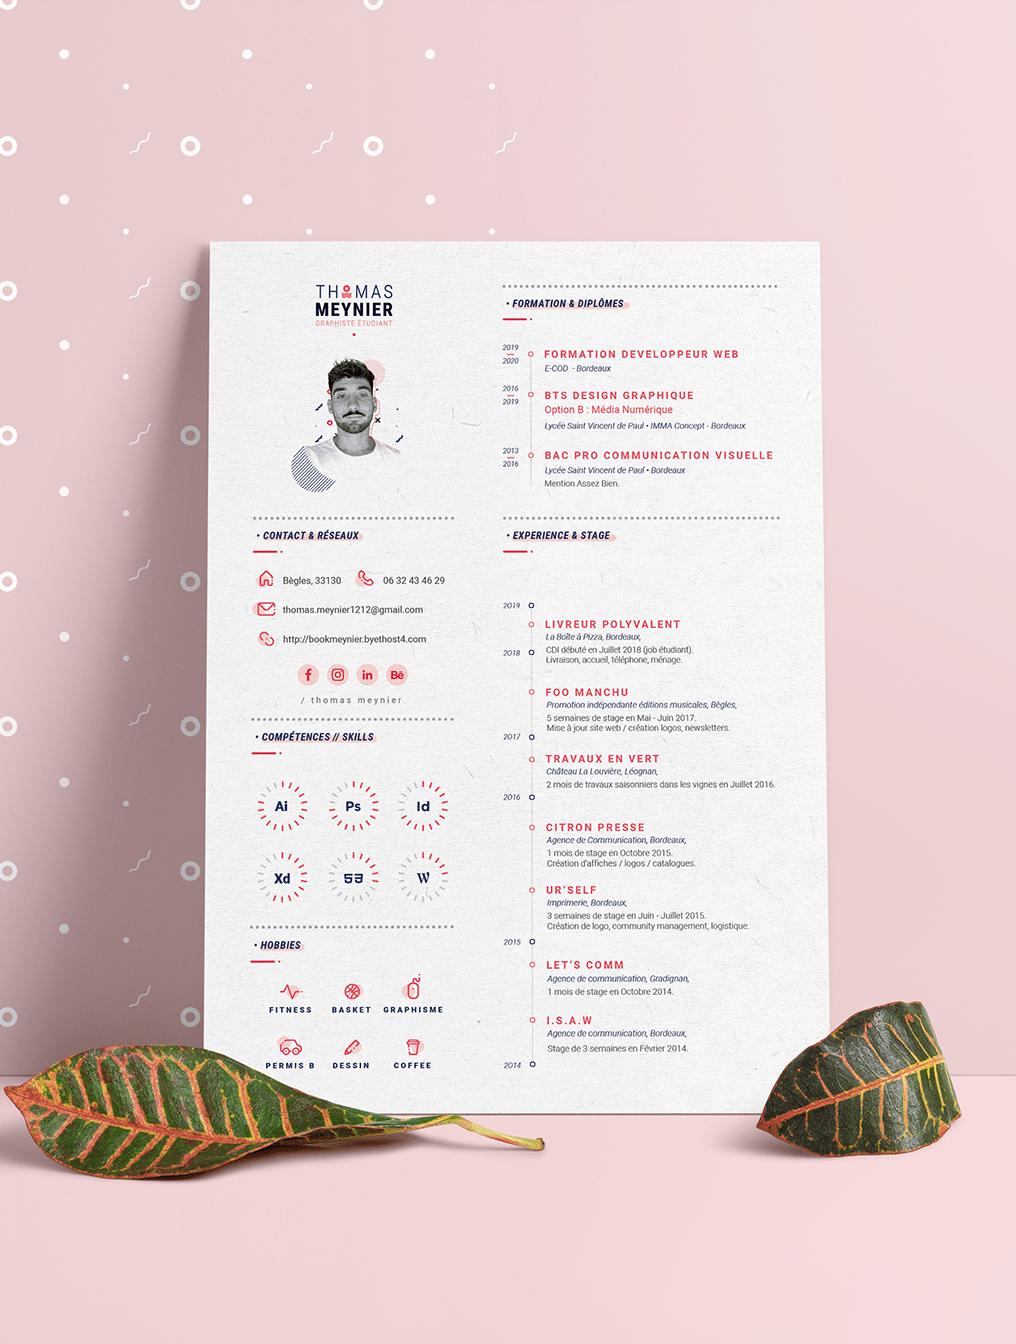 Resume Design Templates Ai Eps A4 Paper Size Download Desain Resume Desain Cv Cv Kreatif